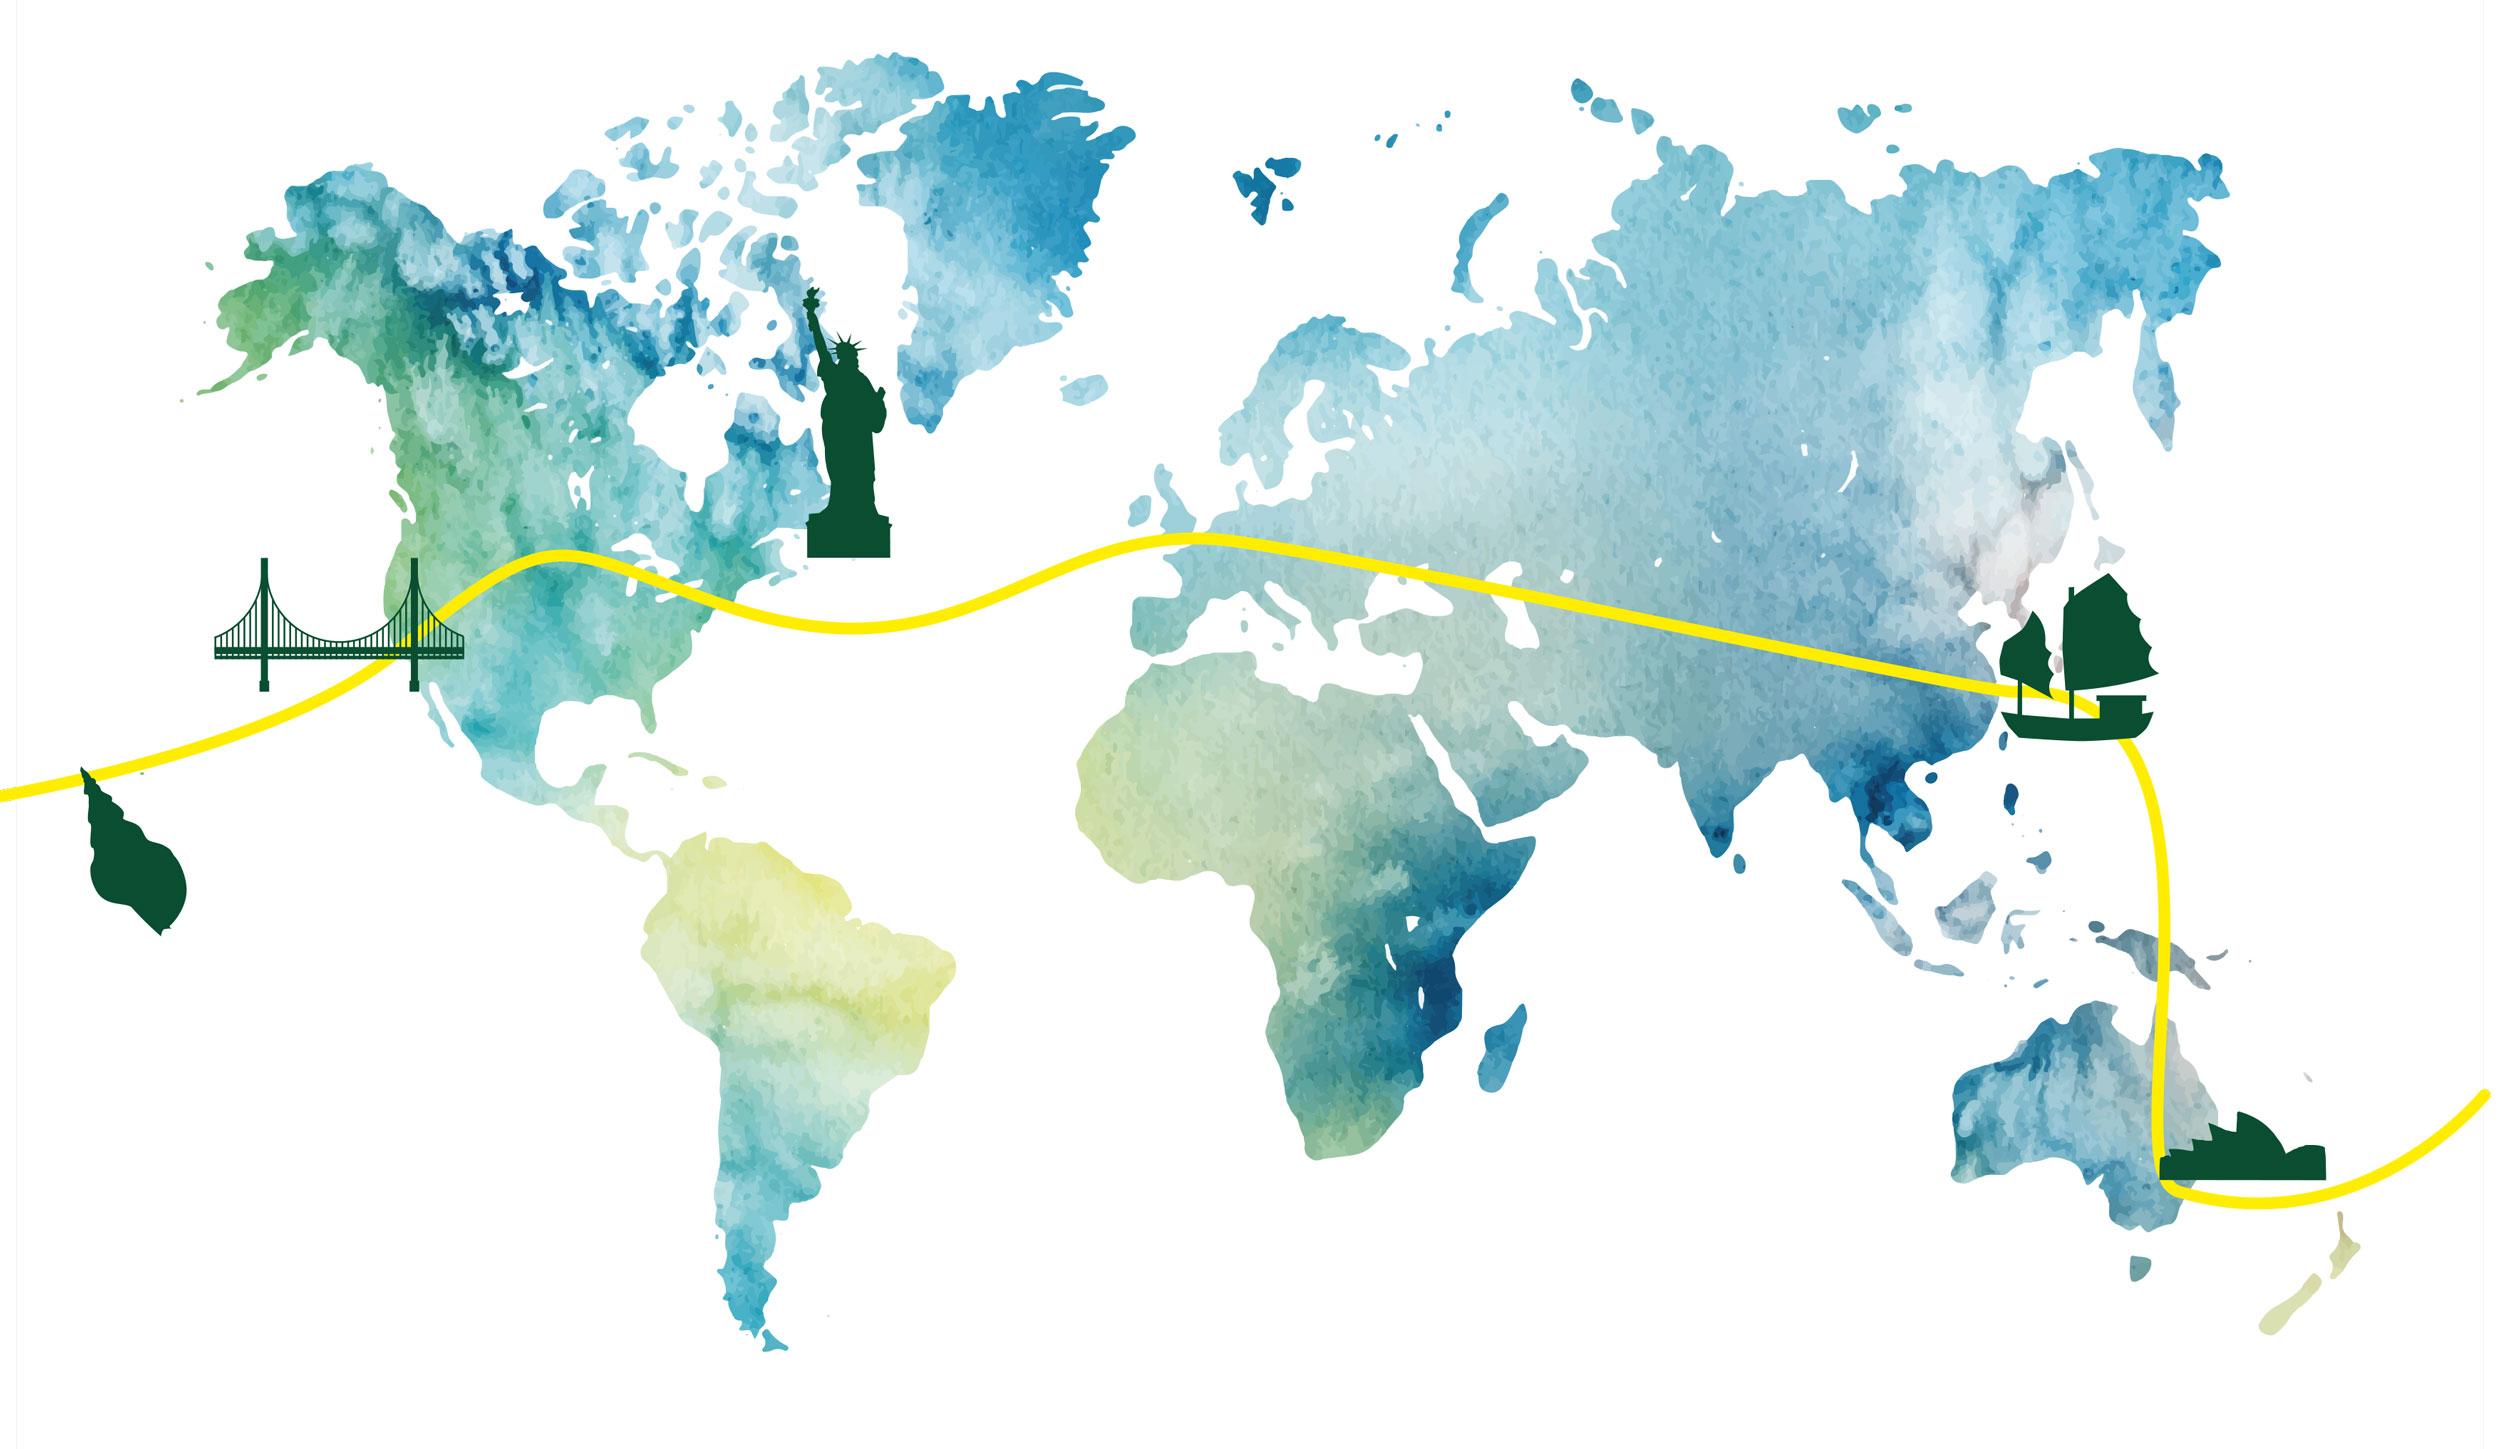 Weltreisen Karte Big Apple bis Südsee